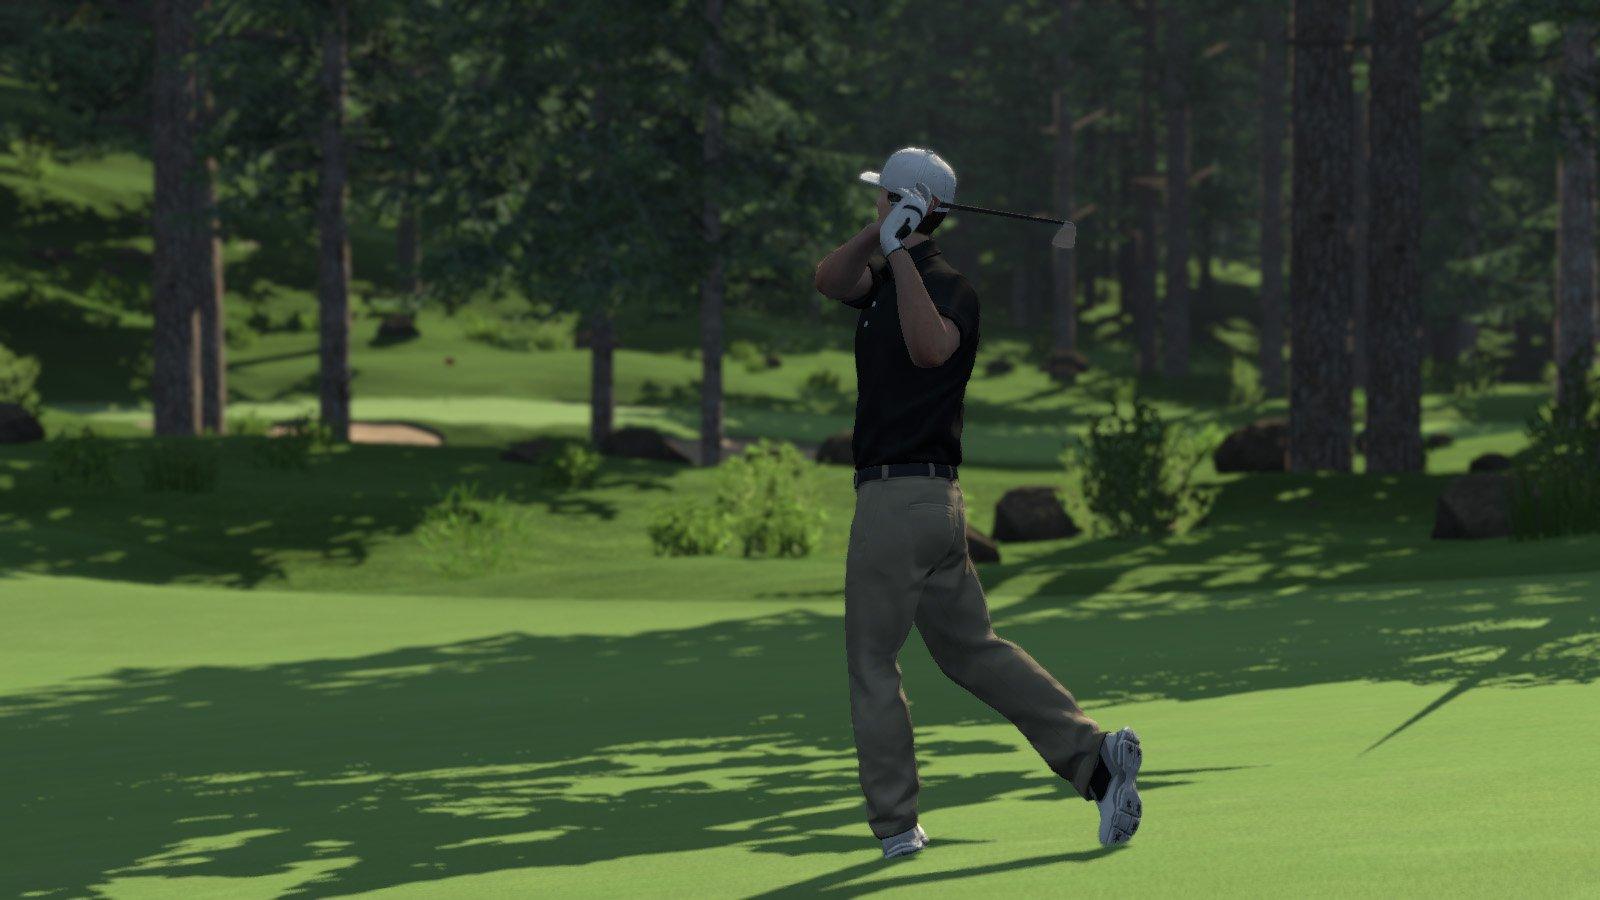 the_golf_club-2449834.jpg